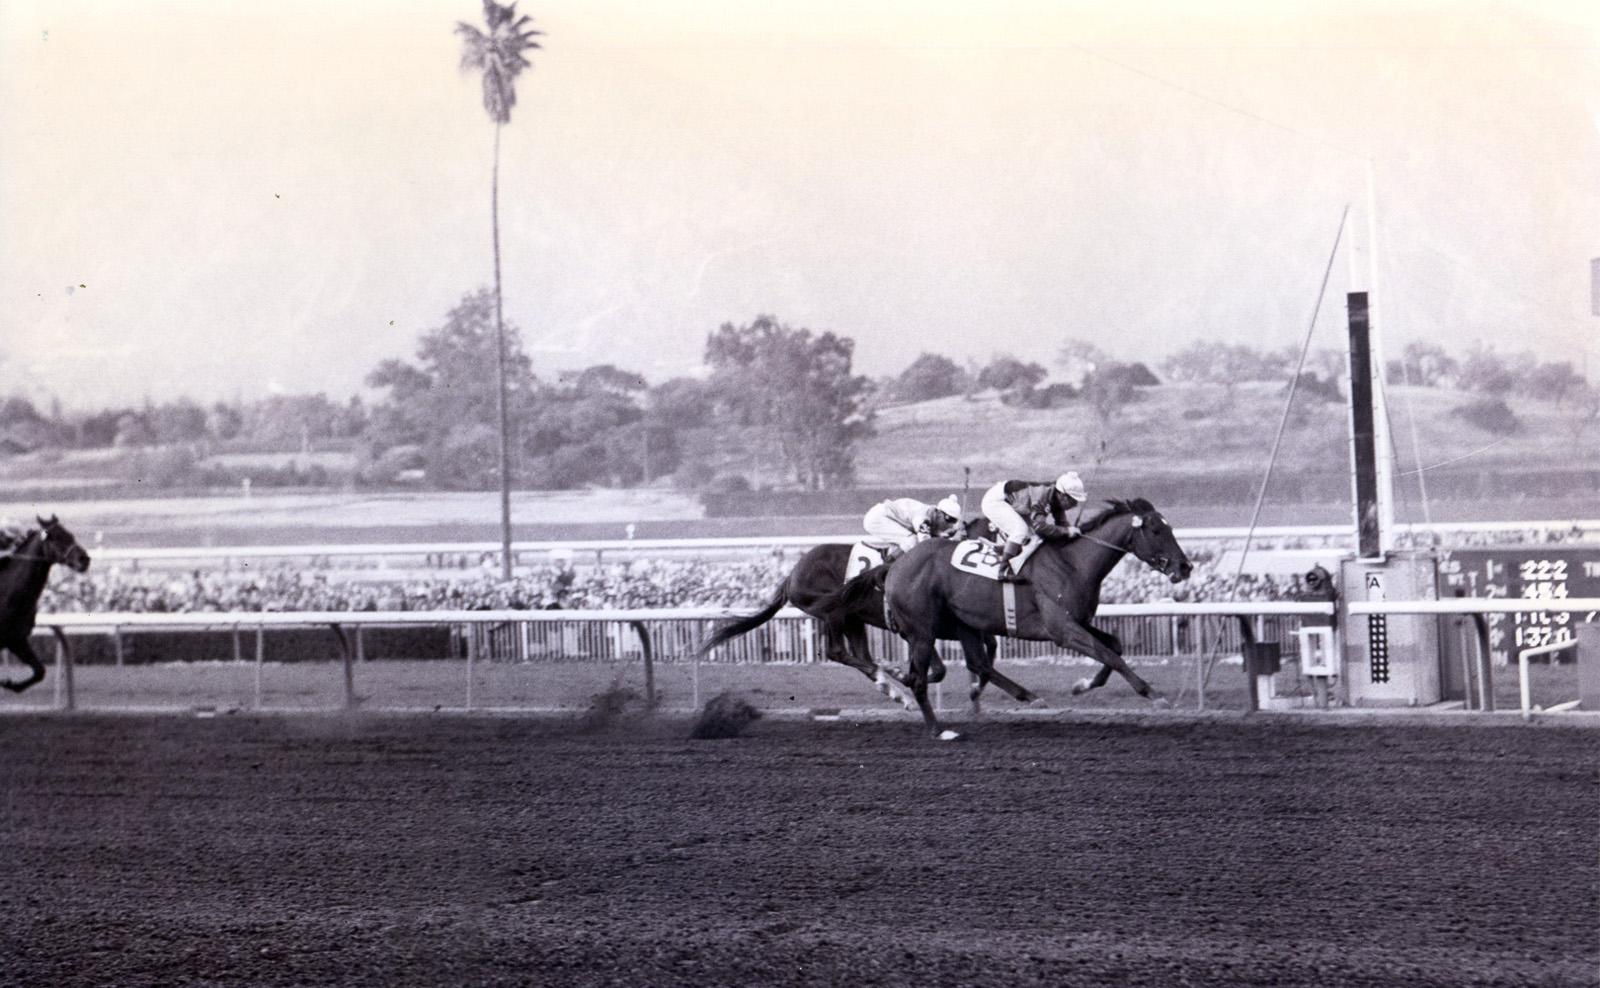 Johnny Longden and Swaps winning the 1955 Santa Anita Derby (Santa Anita Photo/Museum Collection)